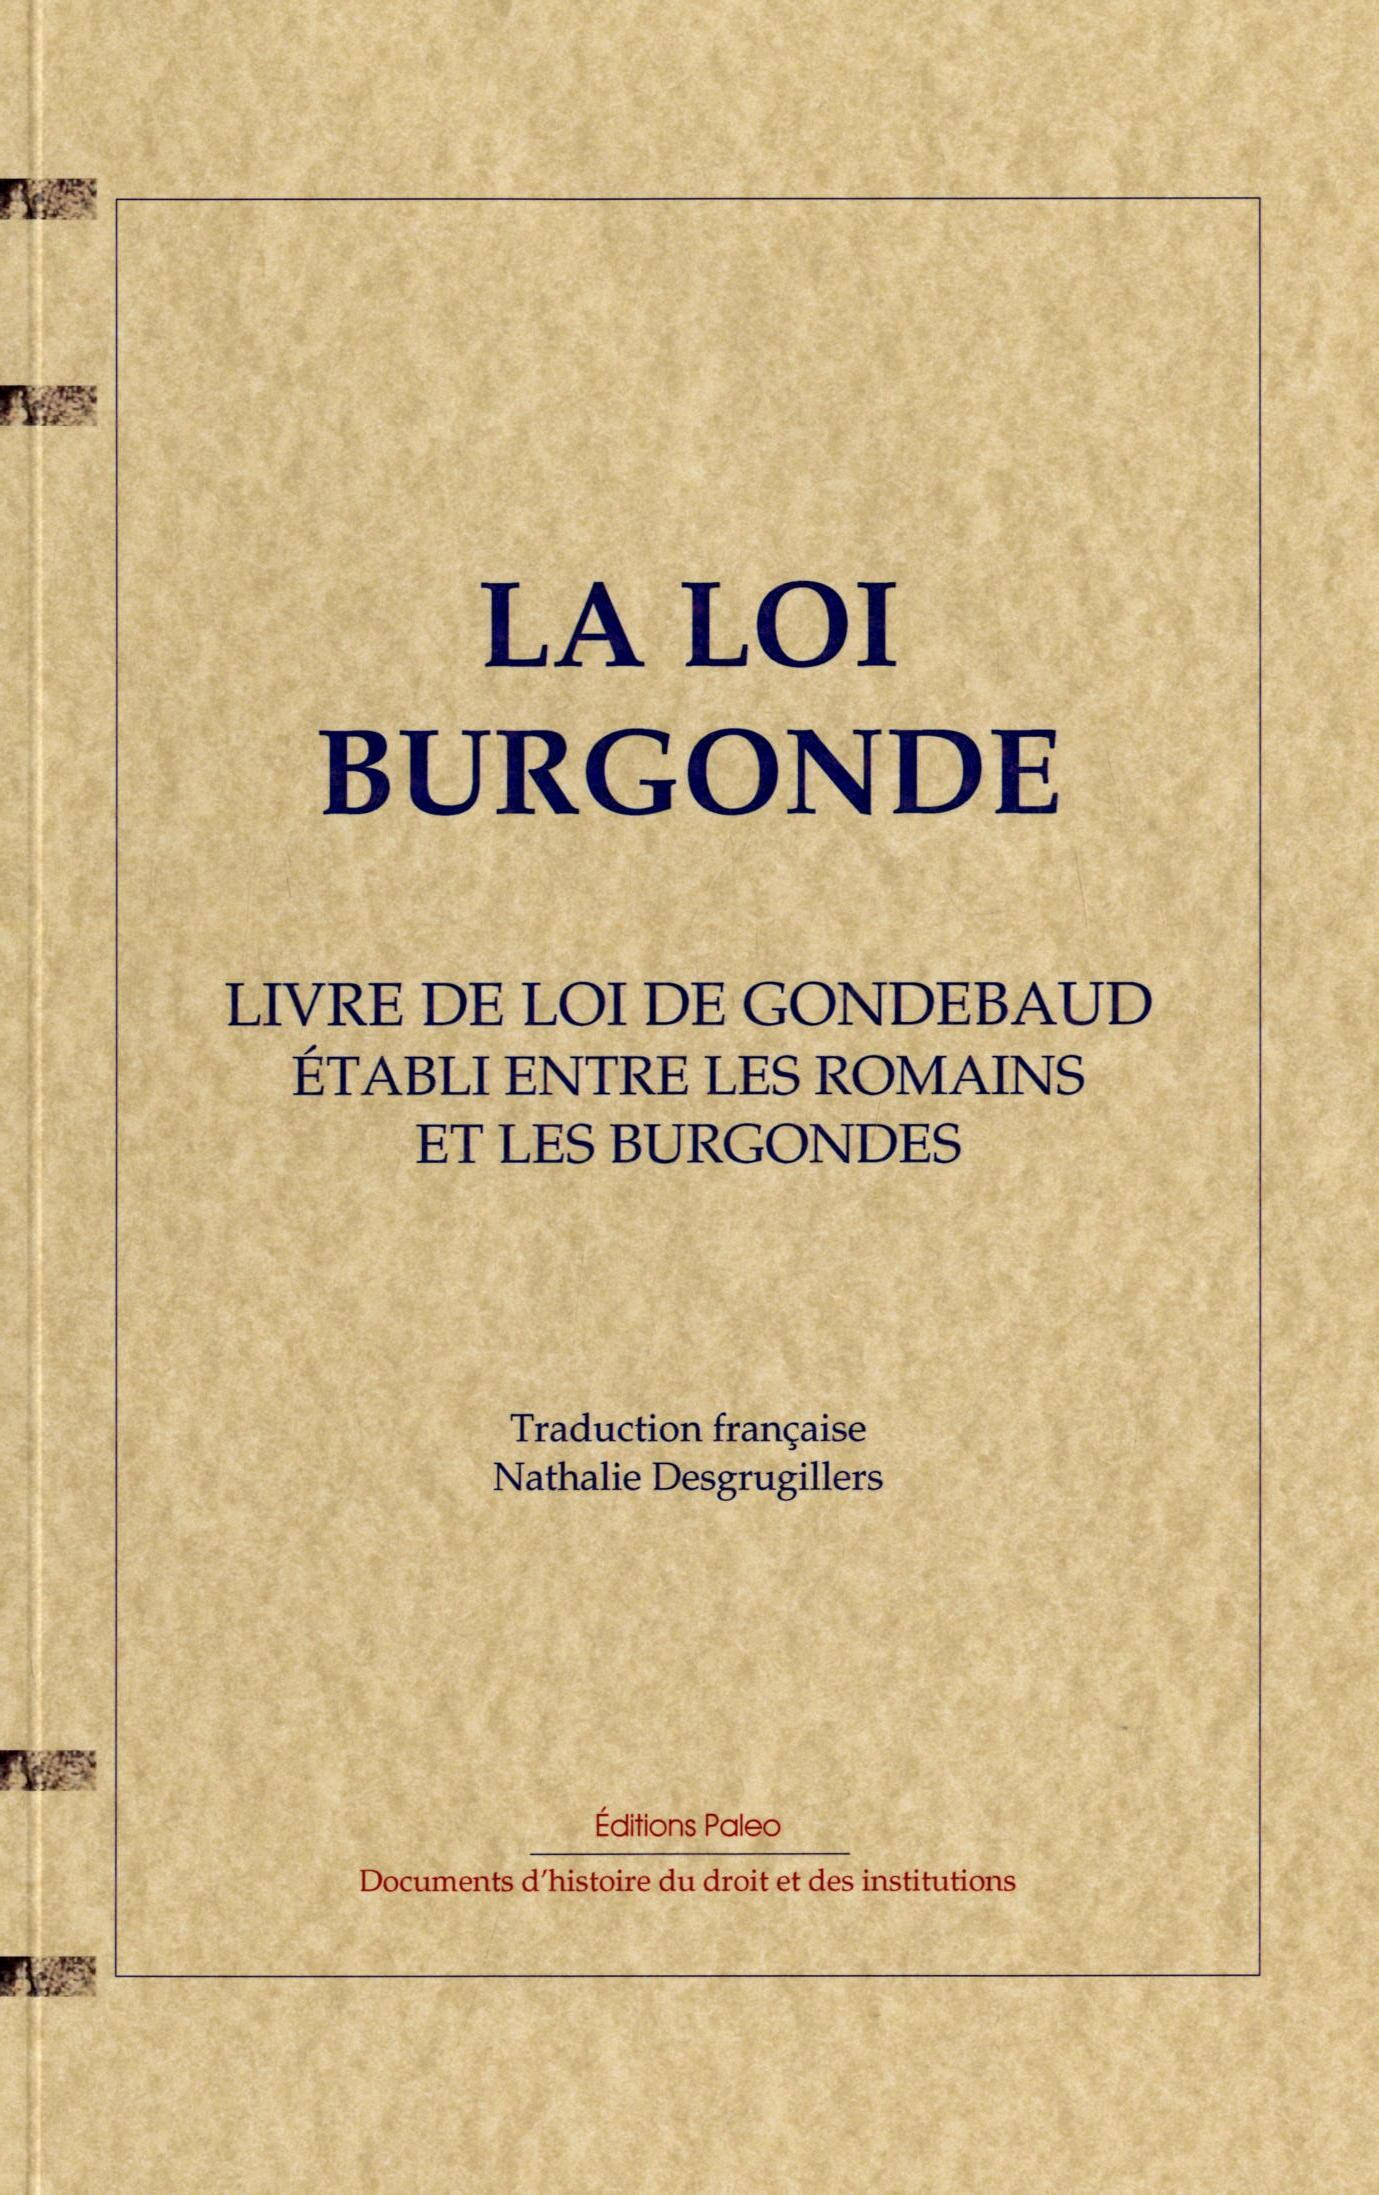 LA LOI BURGONDE (LOI GOMBETTE ET LOI ROMAINE DES BURGONDES)